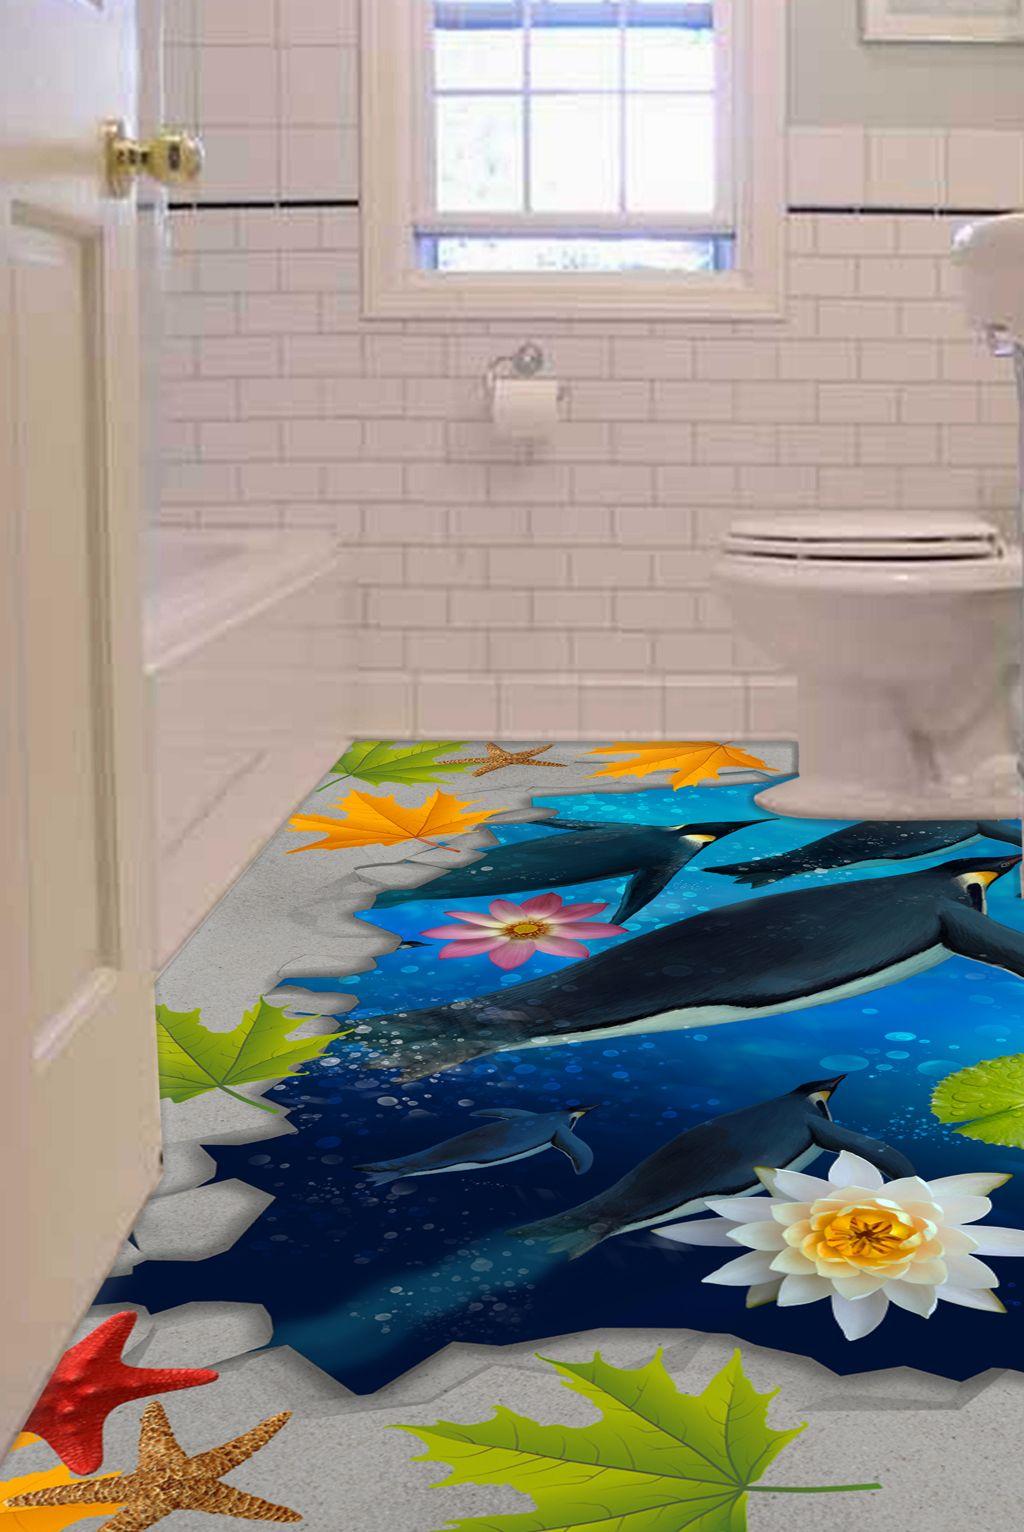 3d Epoxy Flooring For Bathroom Penguin Theme Epoxy Floor 3d Epoxy Floor Flooring